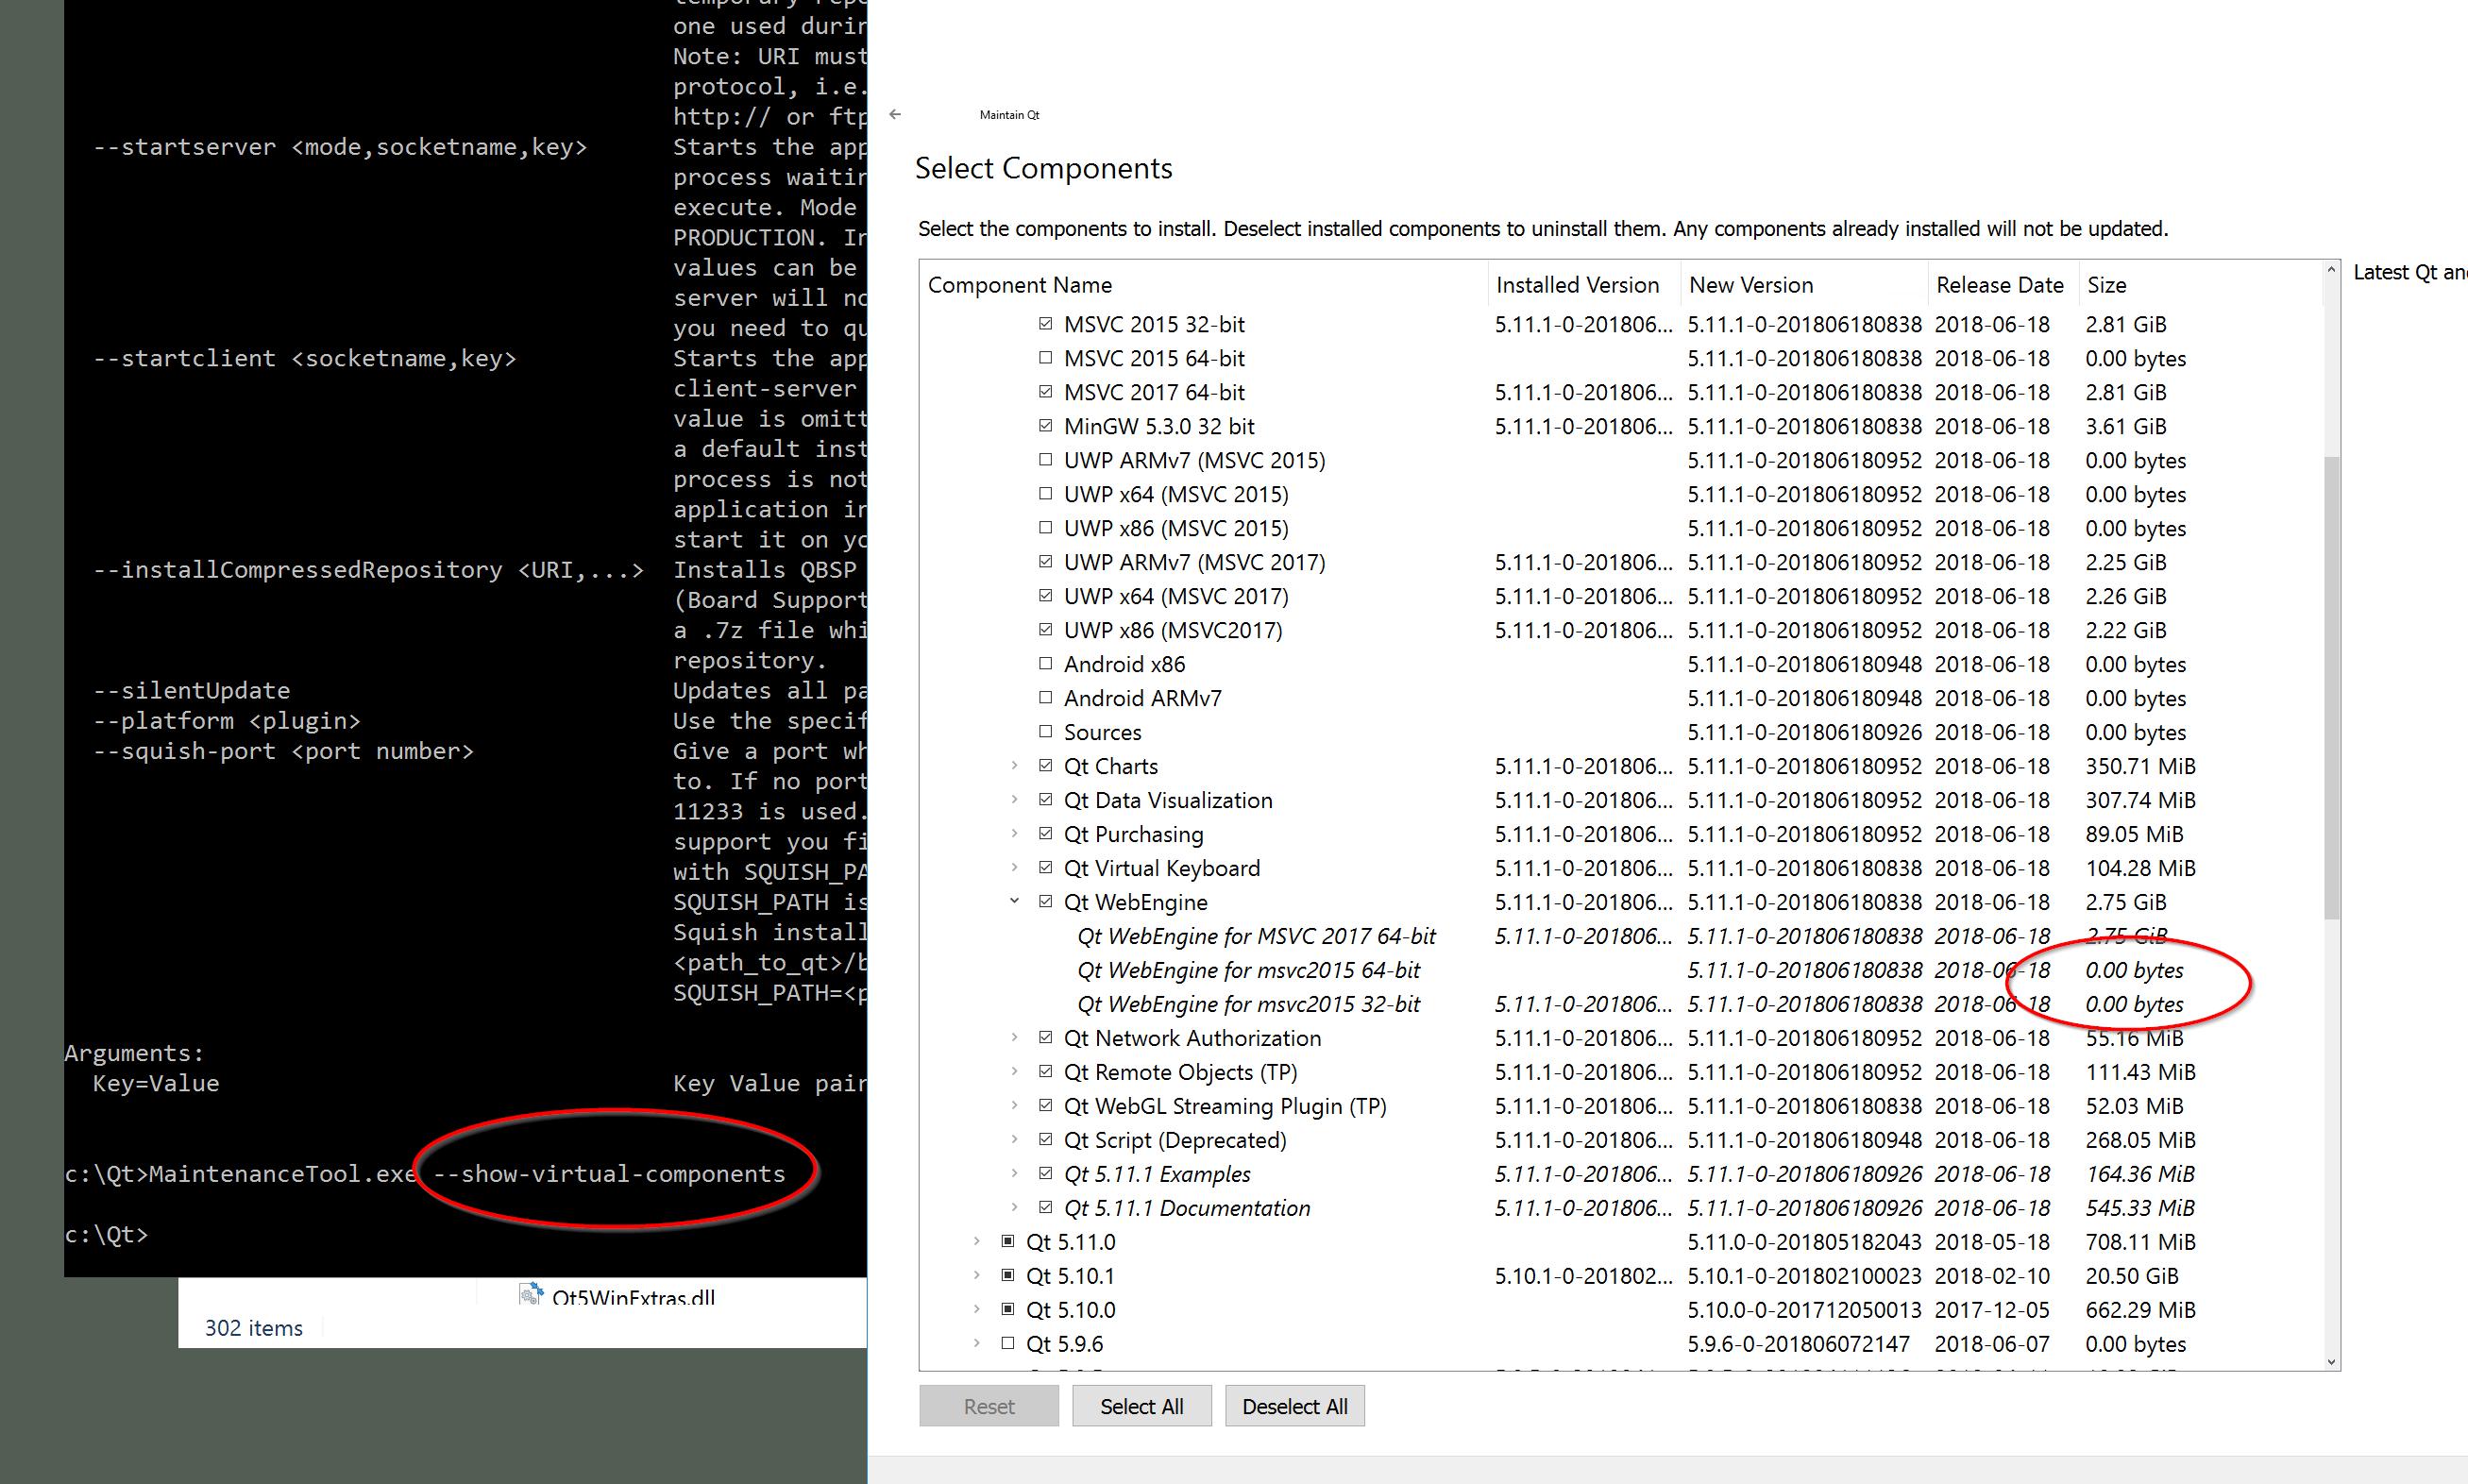 Qt 5.11.1 32 bits] QtWebEngine not found in MSVC 2017 worker · Issue